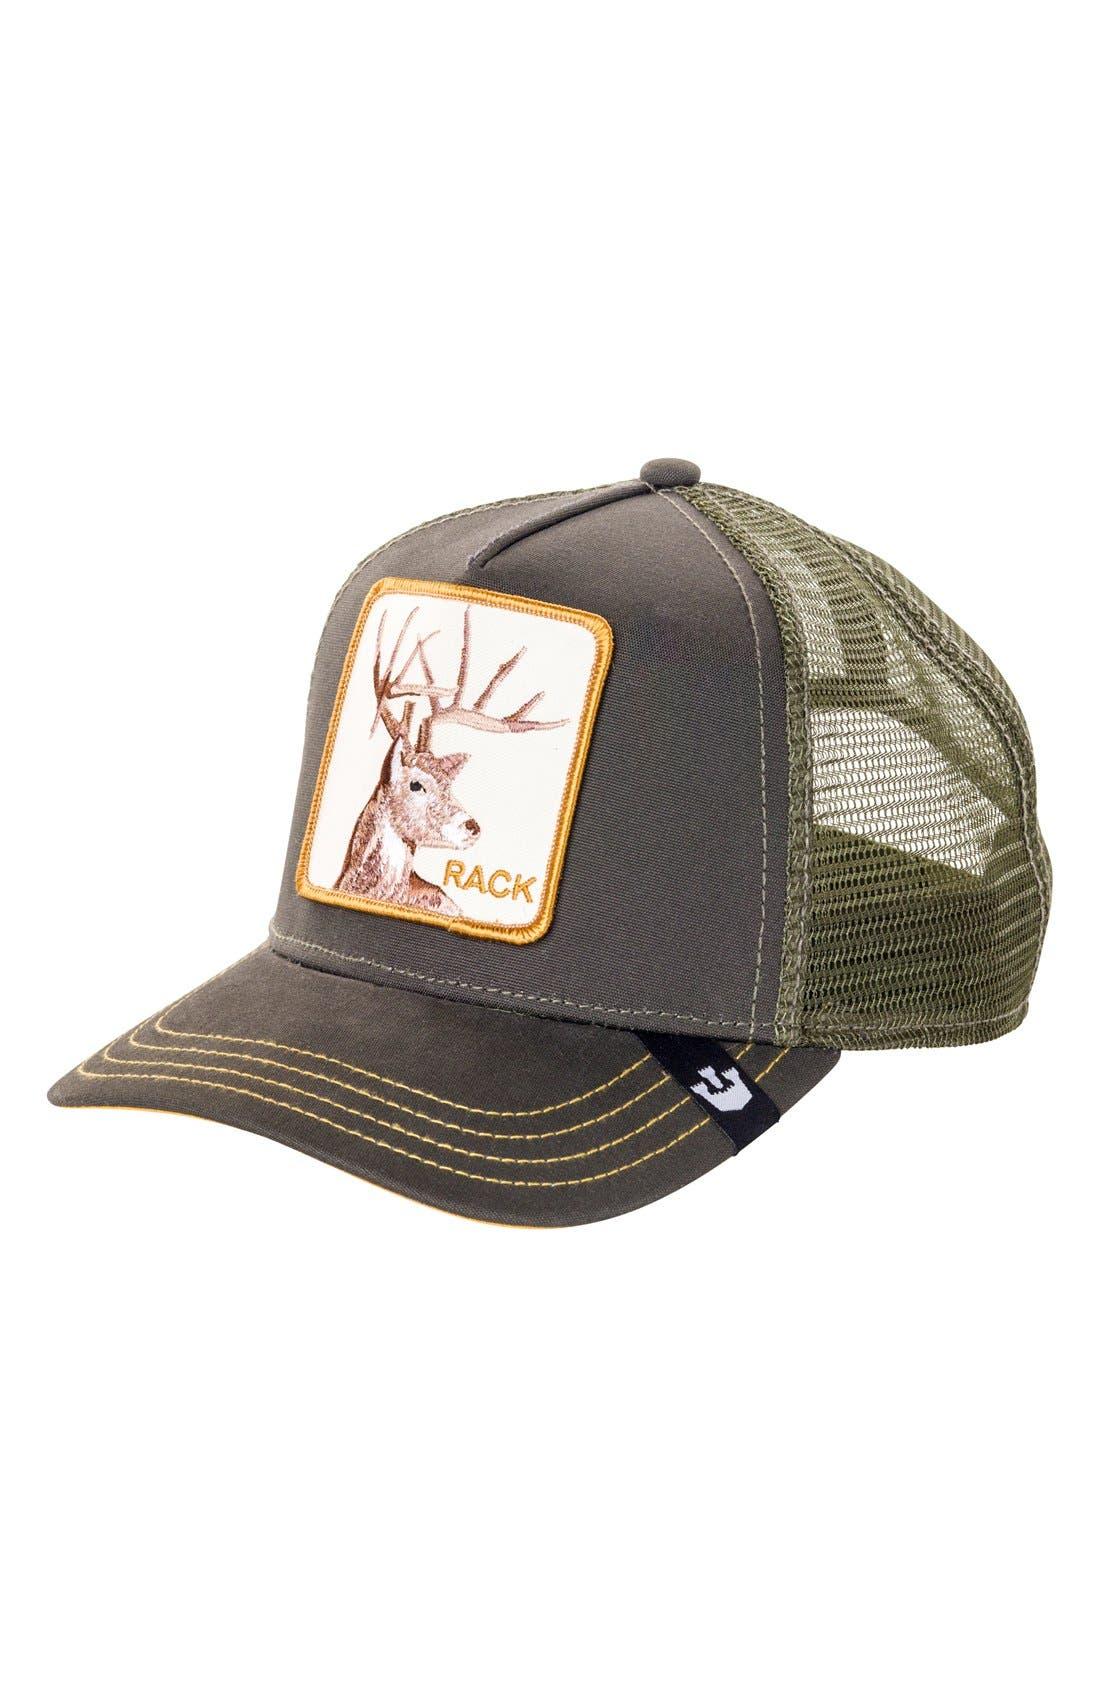 'Animal Farm - Rack' Trucker Hat,                             Main thumbnail 1, color,                             OLIVE